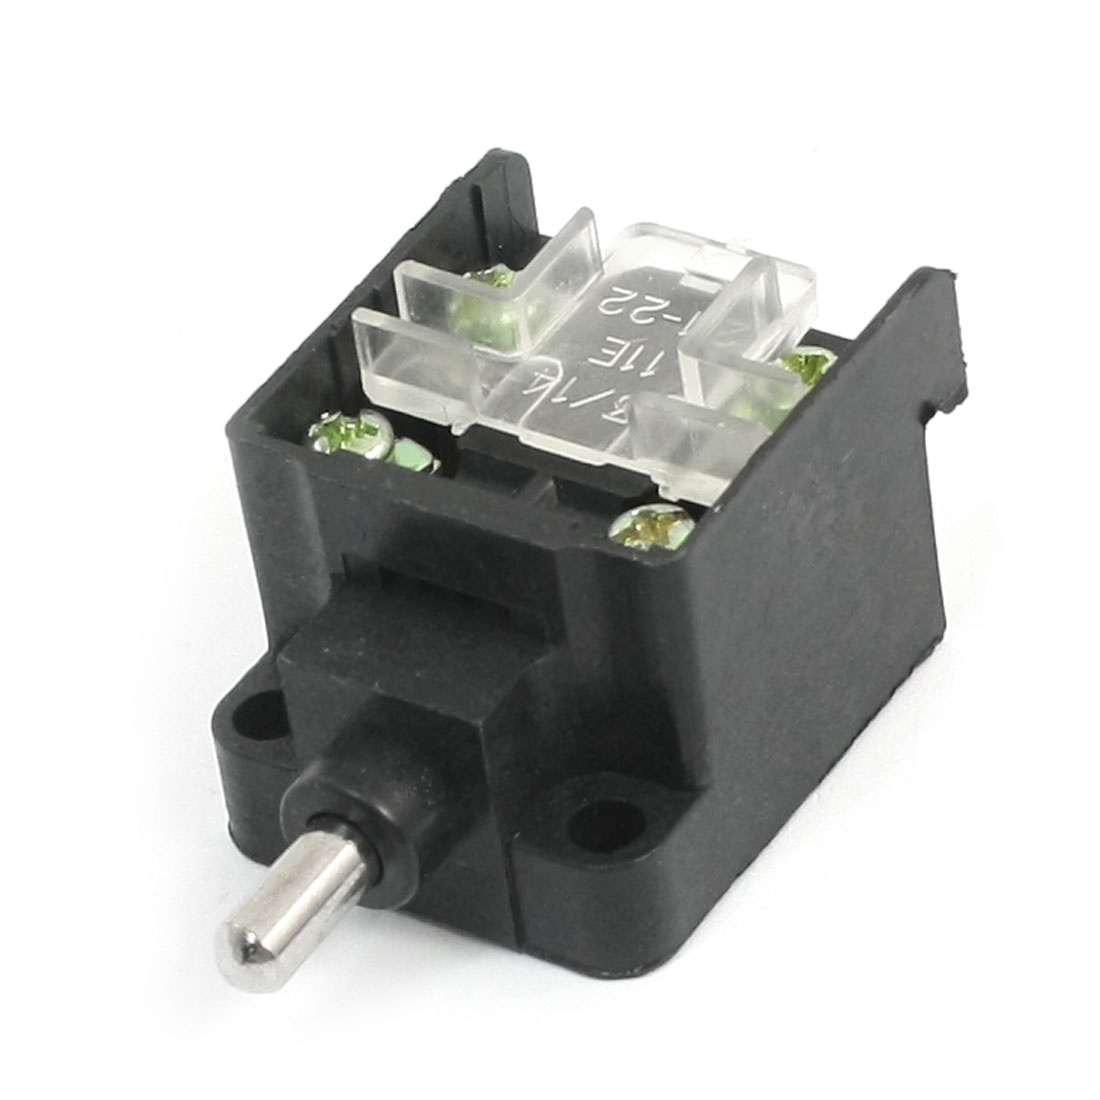 AC380V DC220V 10A SPDT Momentary Actuator Micro Switch LXP1(3SE3)-020/1A